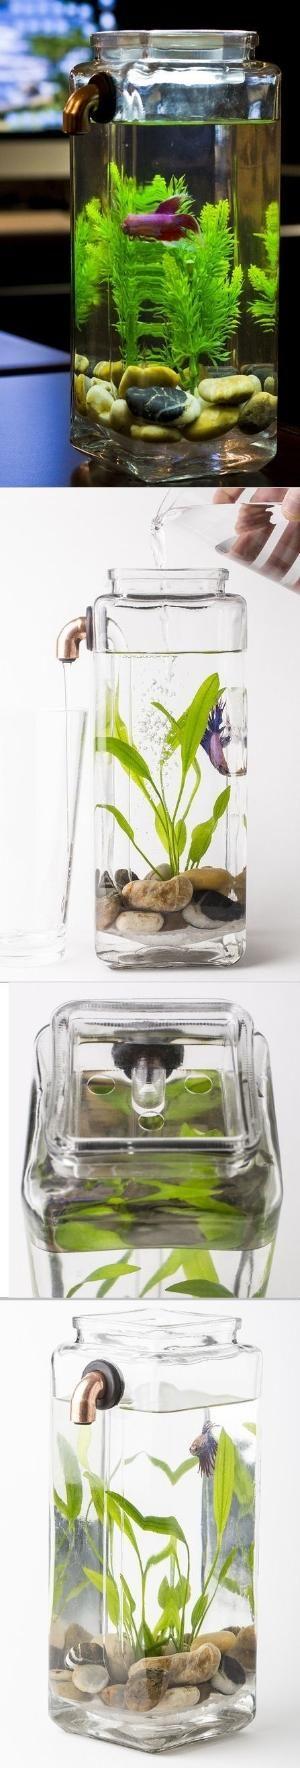 Betta betta aquarium and aquarium on pinterest for Dirty fish tank